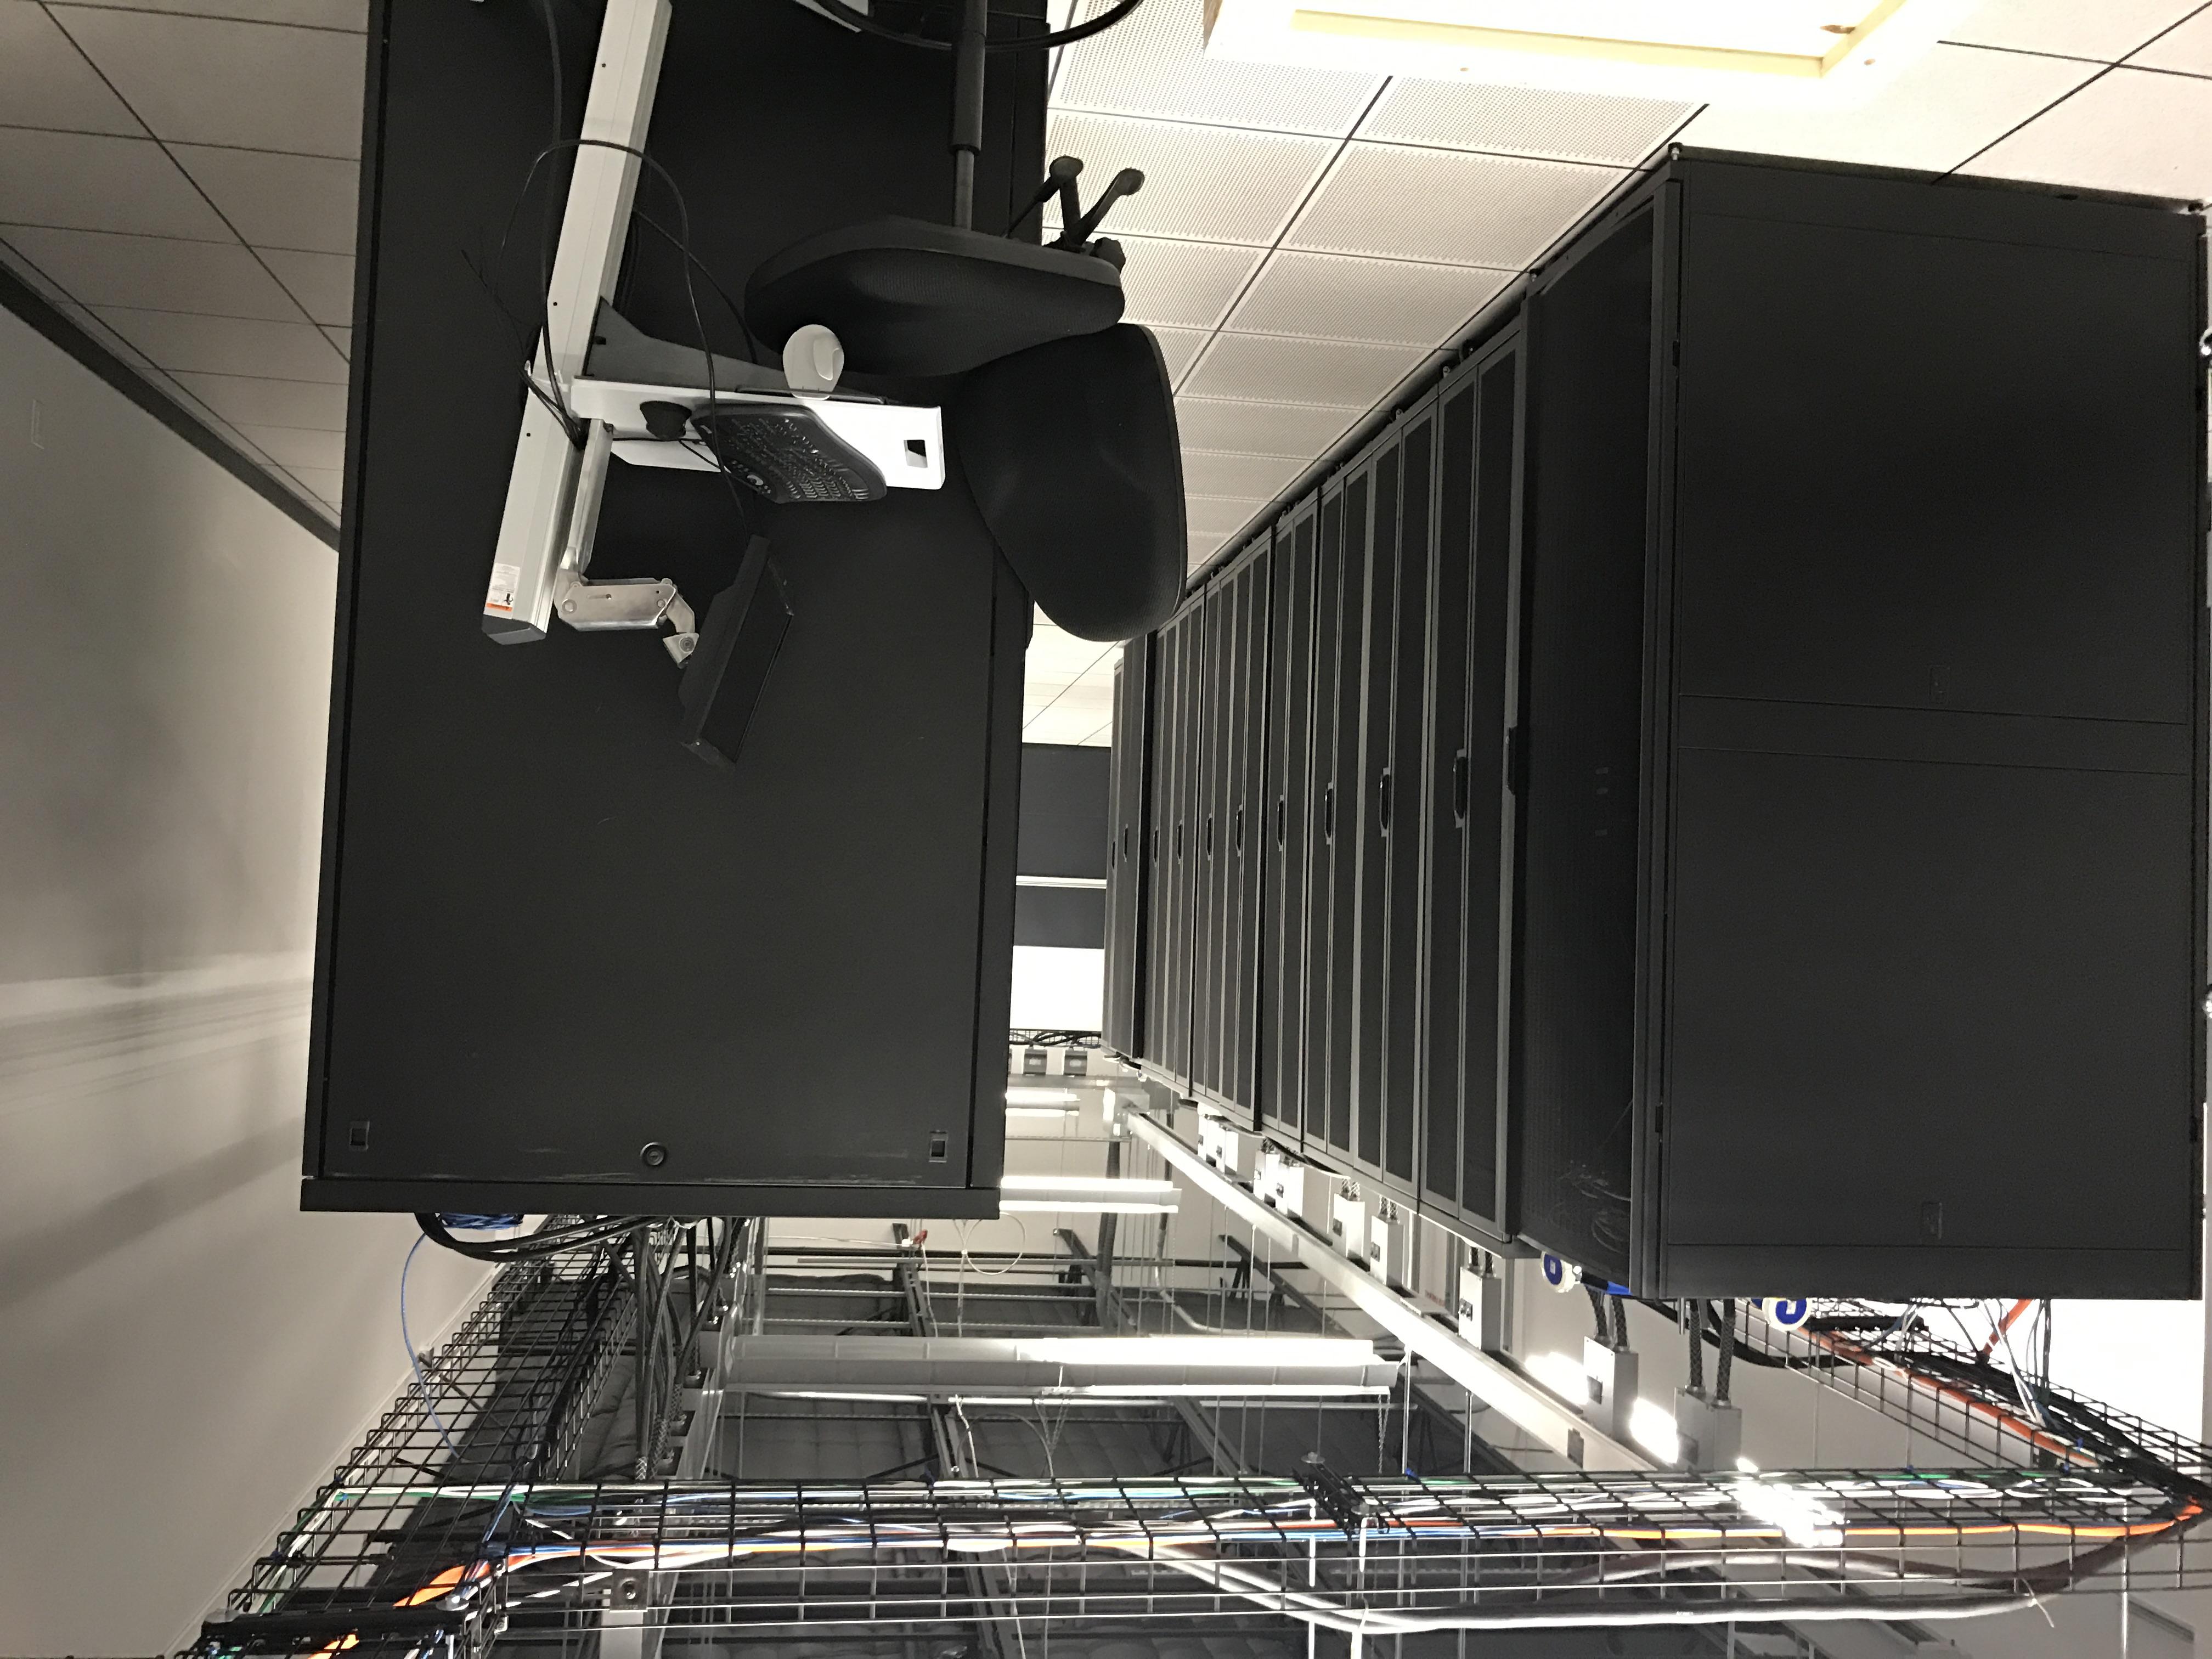 Data Center View 2